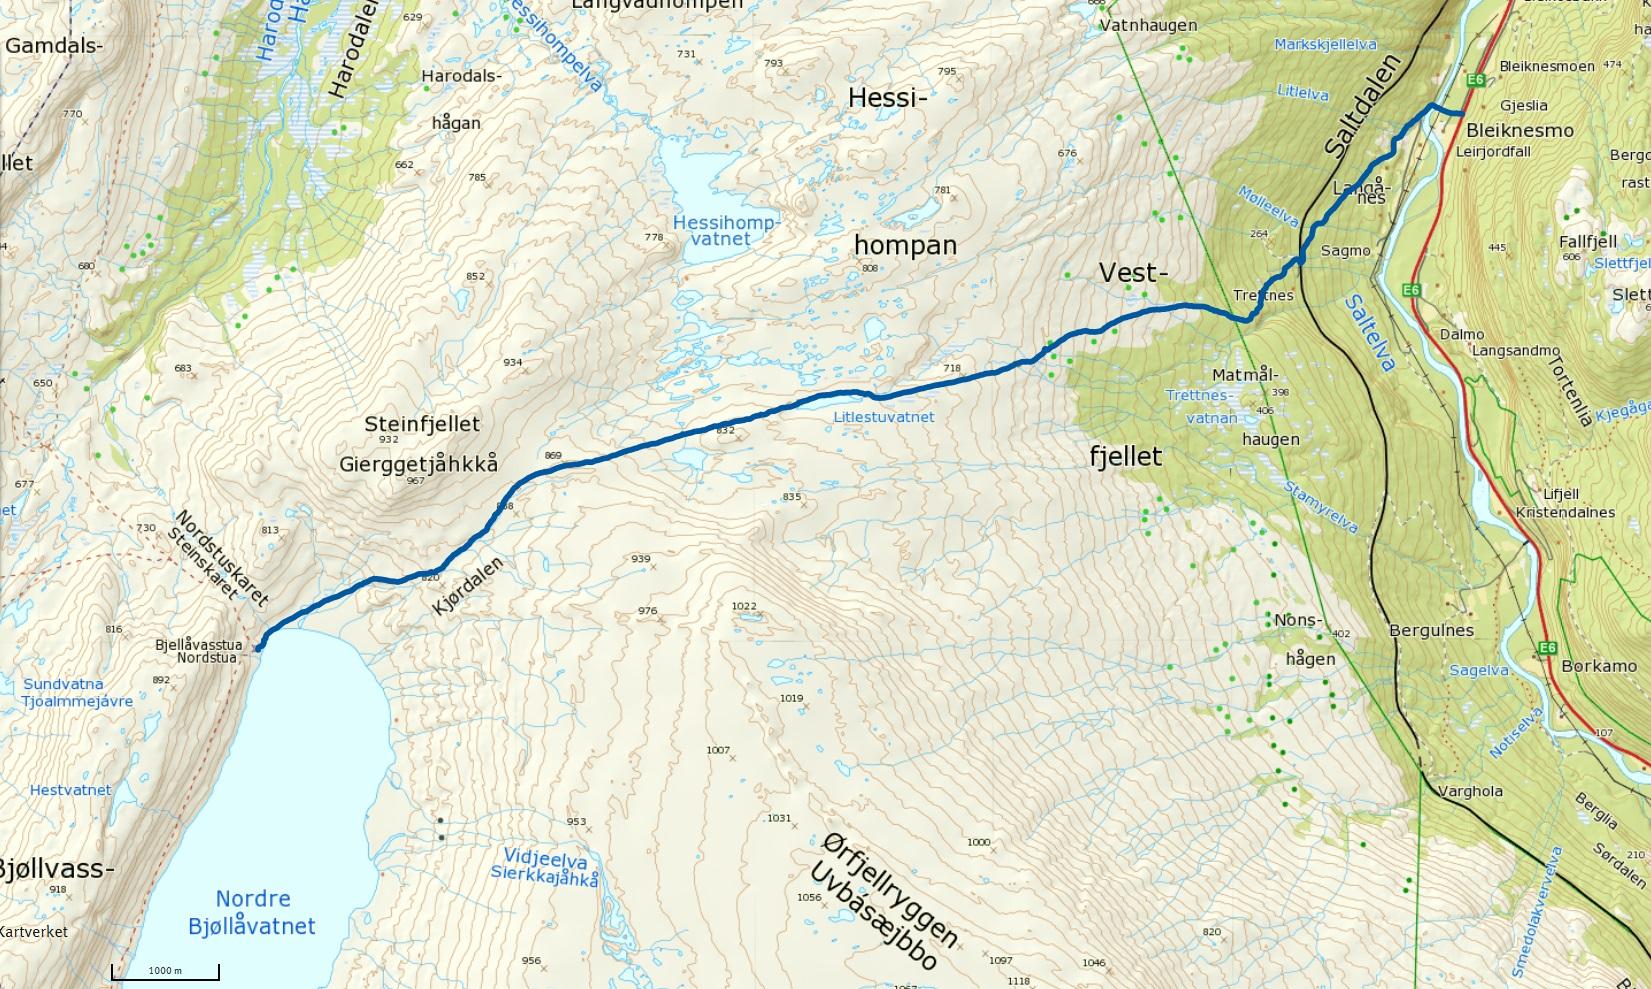 Telegrafruta saltfjellet kart